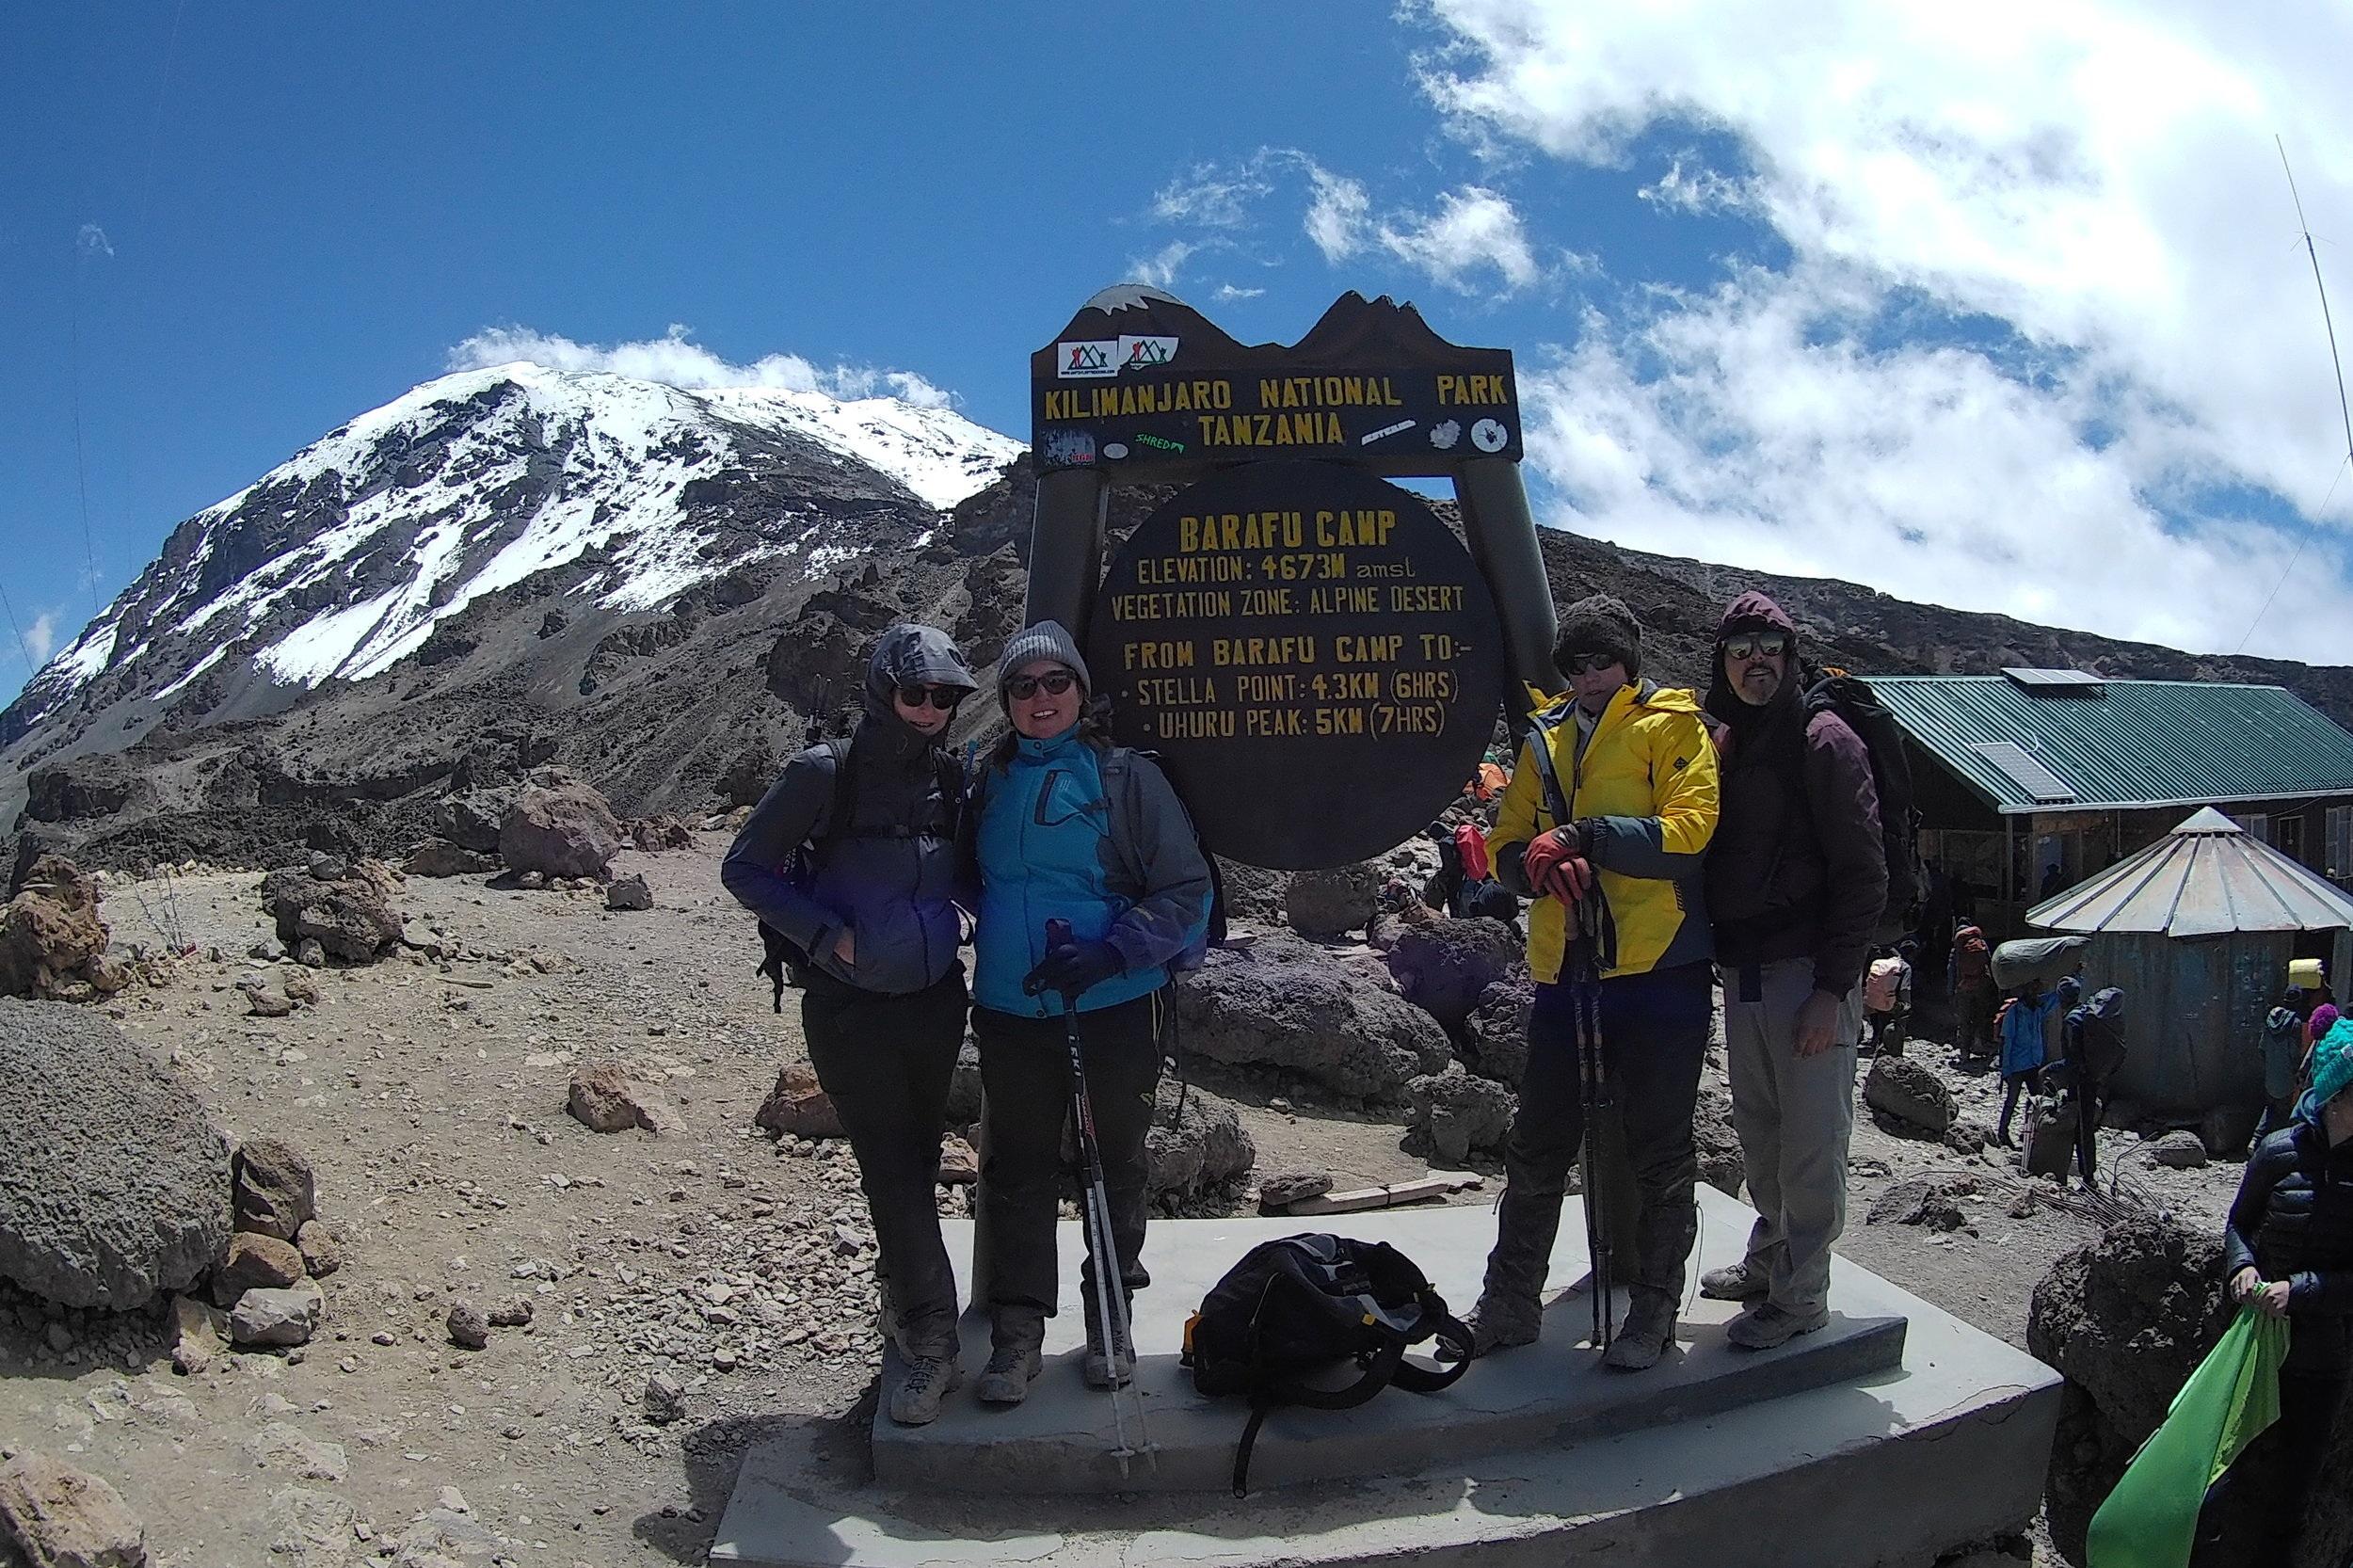 Kilimanjaro-national-park.JPG